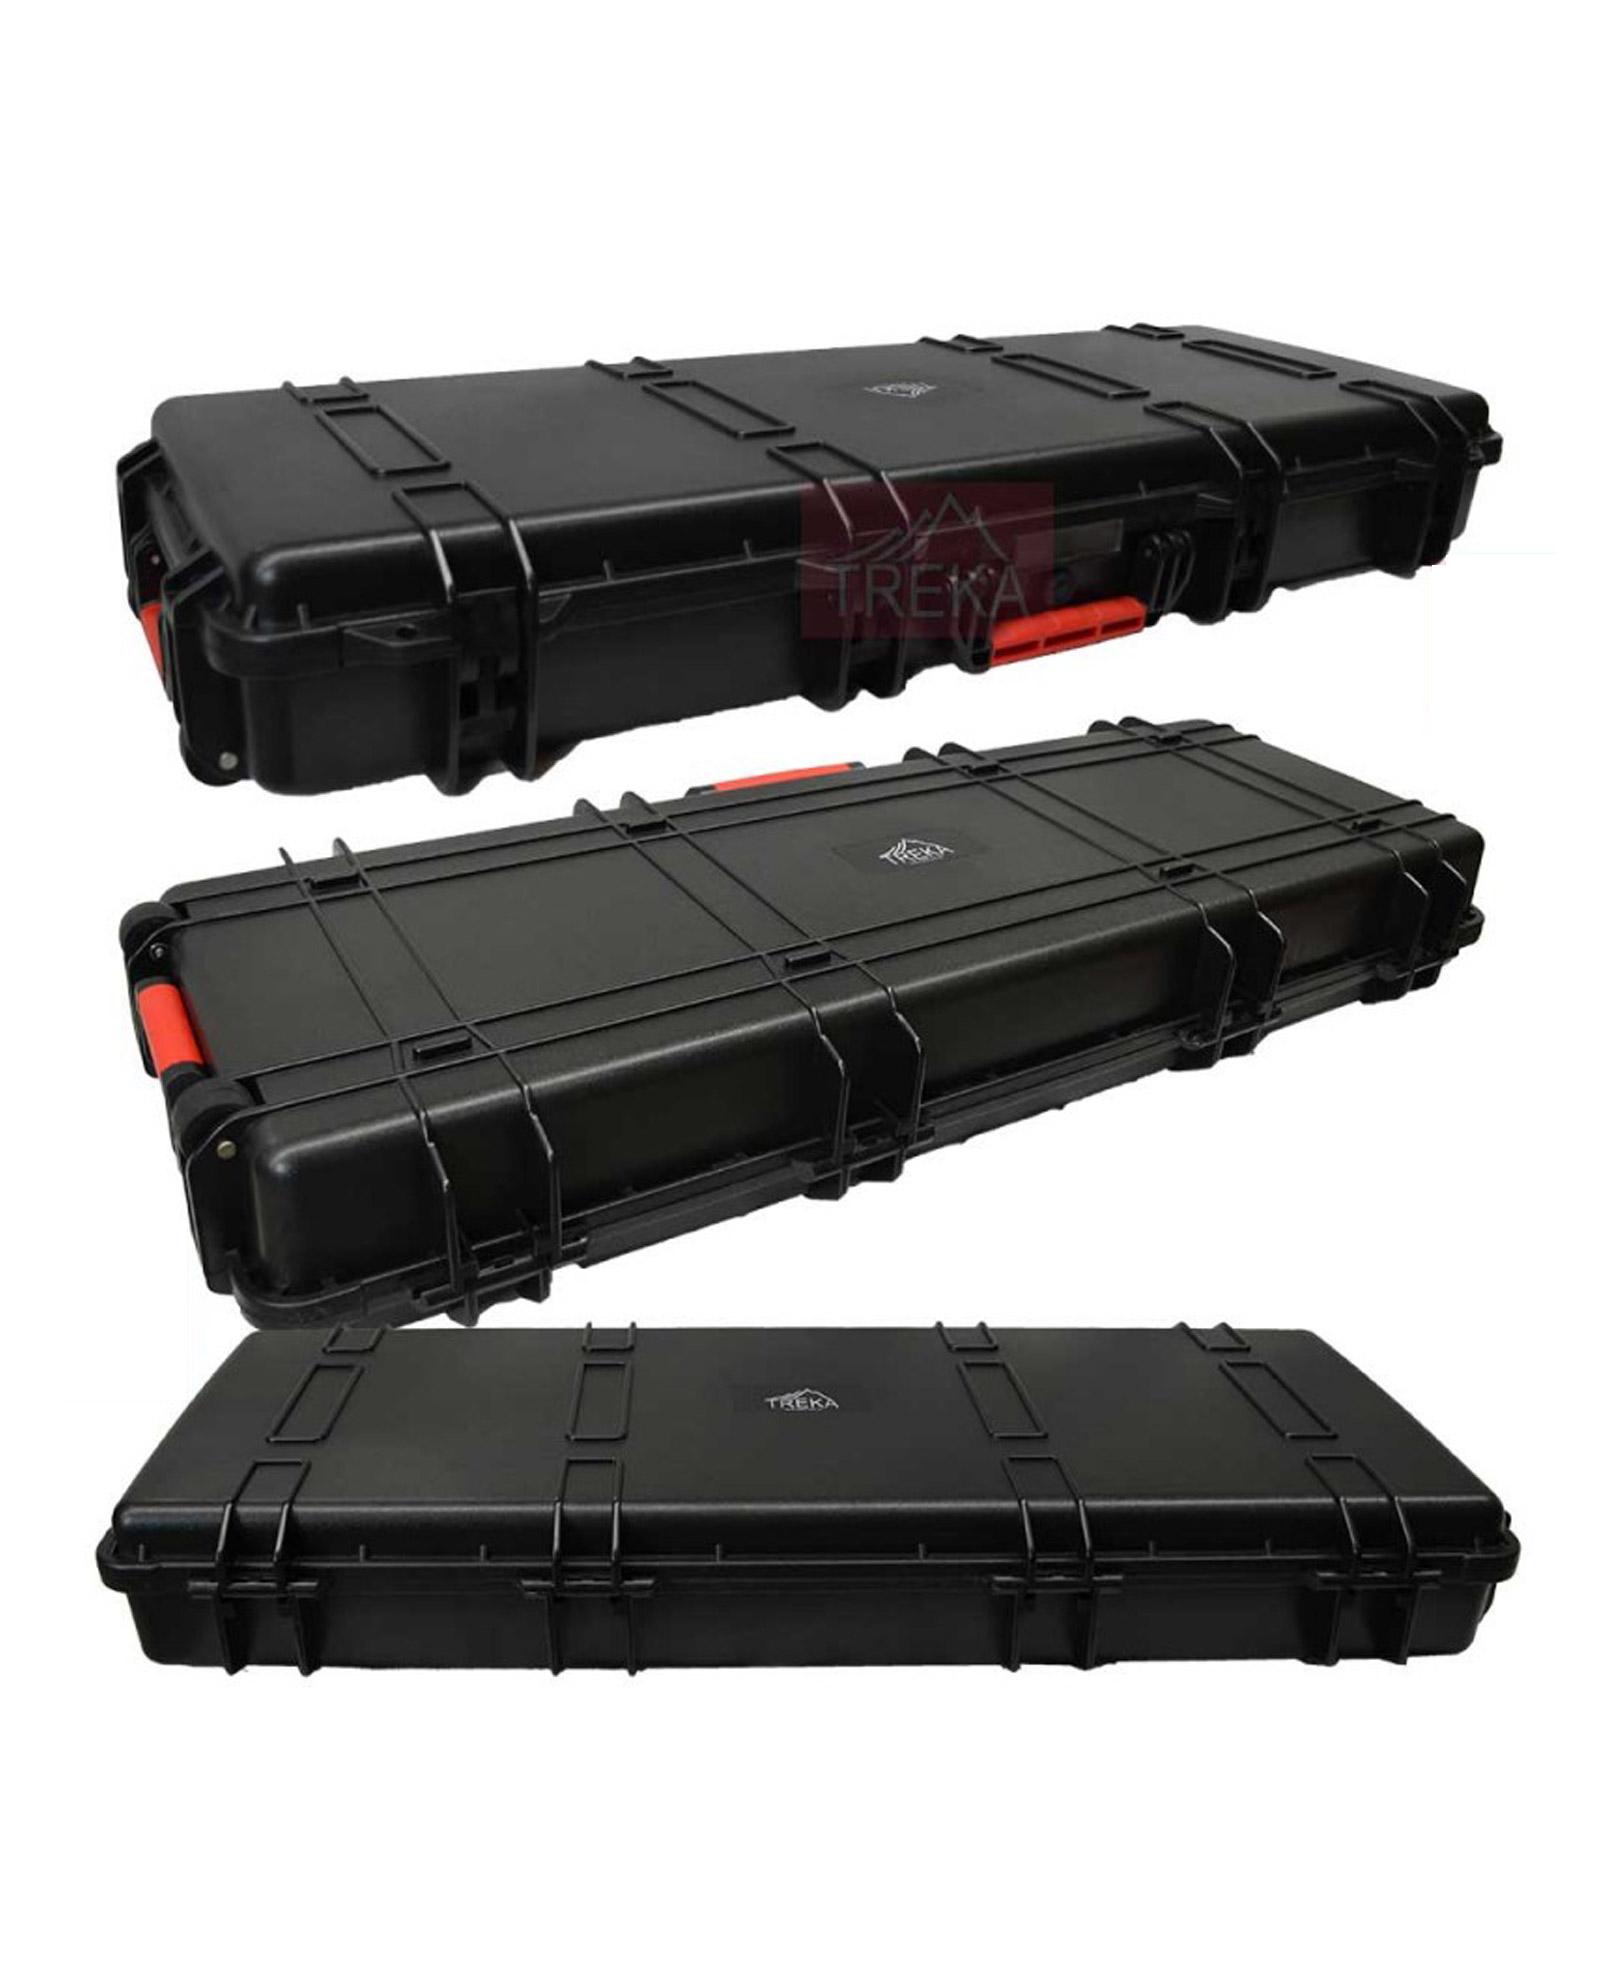 Treka 1400 ABS Case